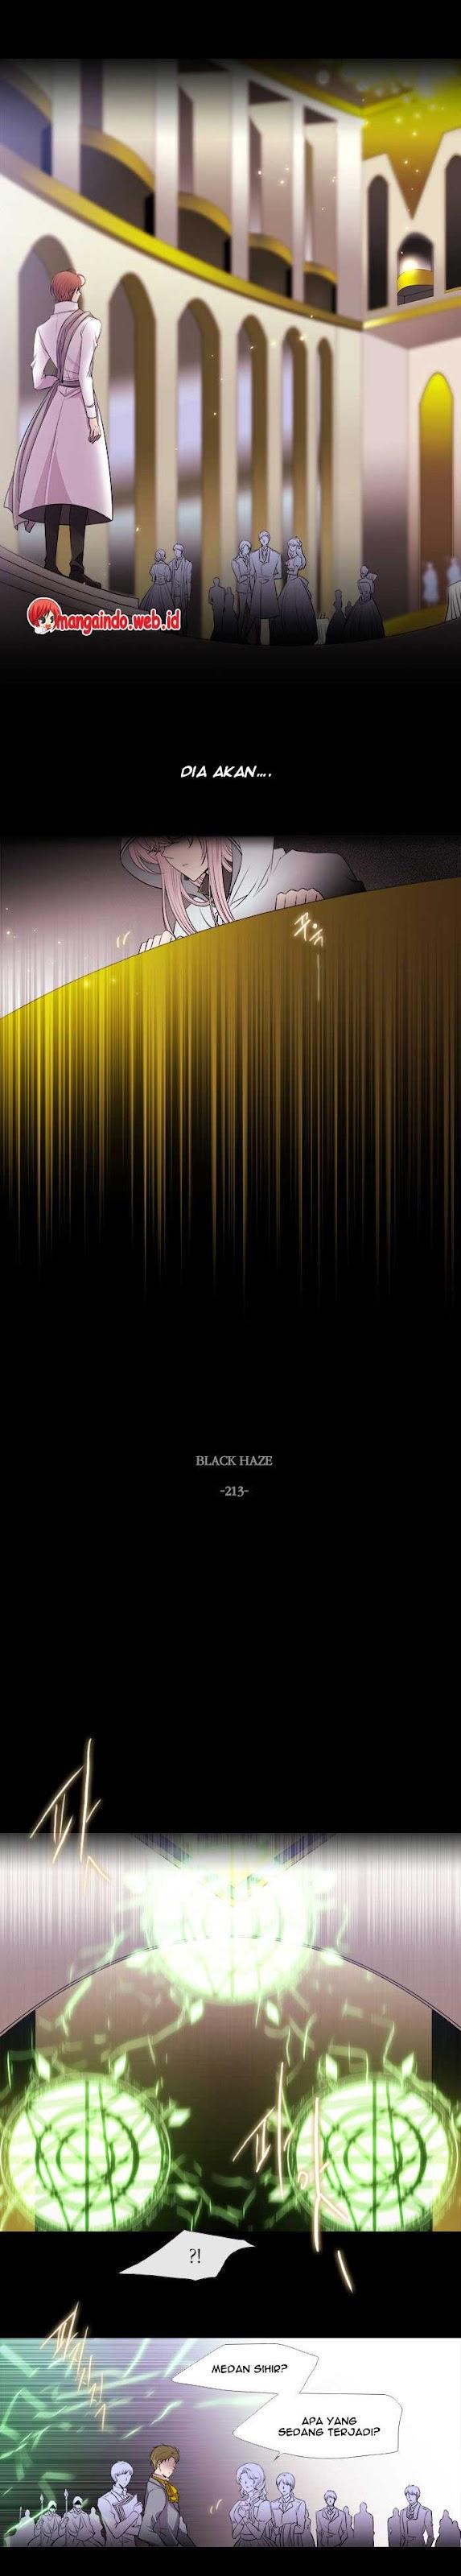 Komik black haze 213 - chapter 213 214 Indonesia black haze 213 - chapter 213 Terbaru 5|Baca Manga Komik Indonesia